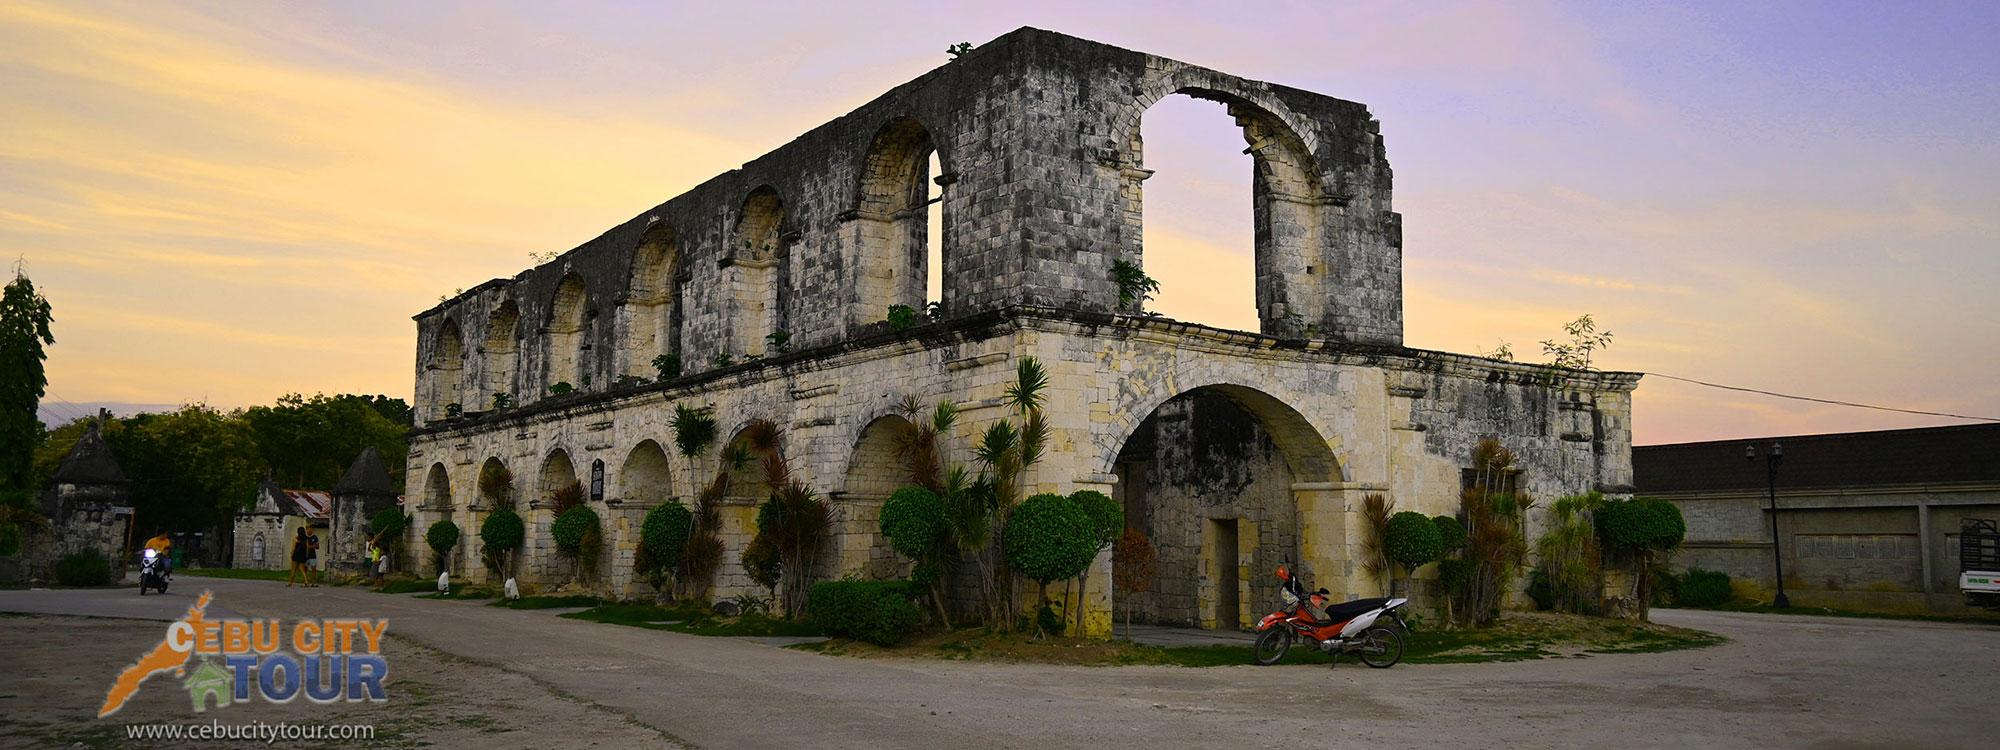 Oslob Cuartel - Spanish Ruins